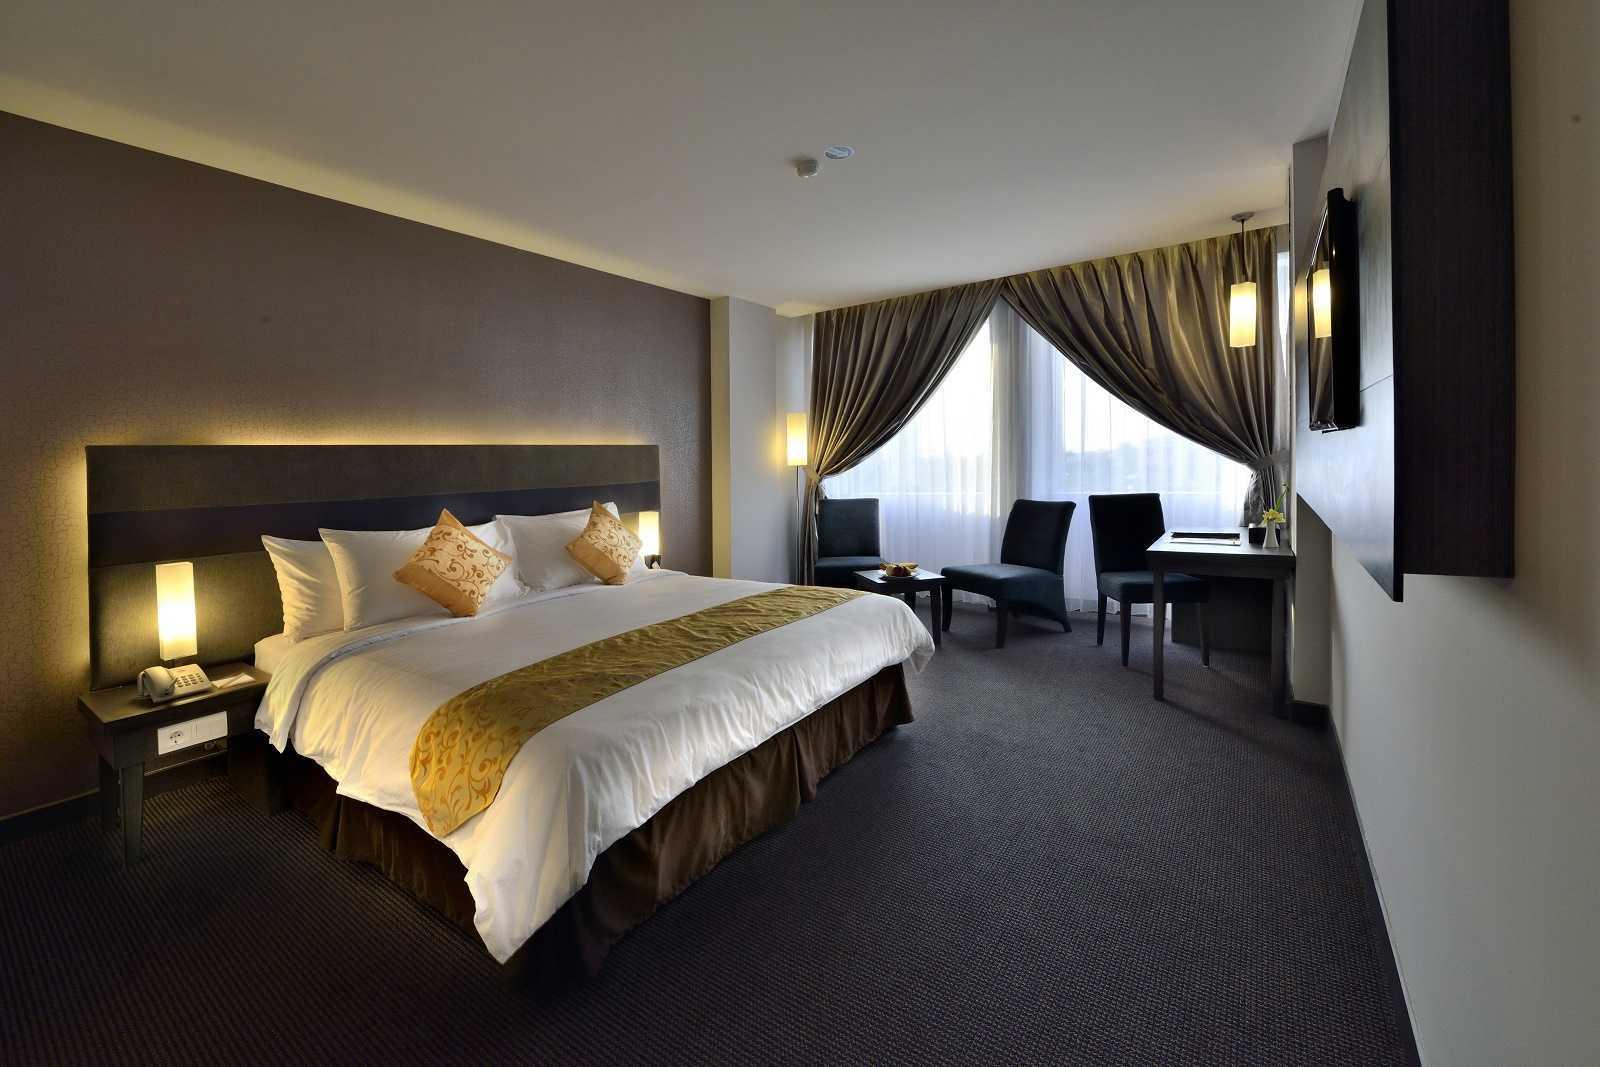 Melly Purnamahildha Tarman Grand Tjokro Pekanbaru Pekanbaru, Riau, Indonesia Pekanbaru, Riau, Indonesia Deluxe Room Modern Deluxe Room  (Image: Http://www.grandtjokro.com/hotel-Grand-Tjokro-Pekanbaru-In-Pekanbaru/photos/) 20454